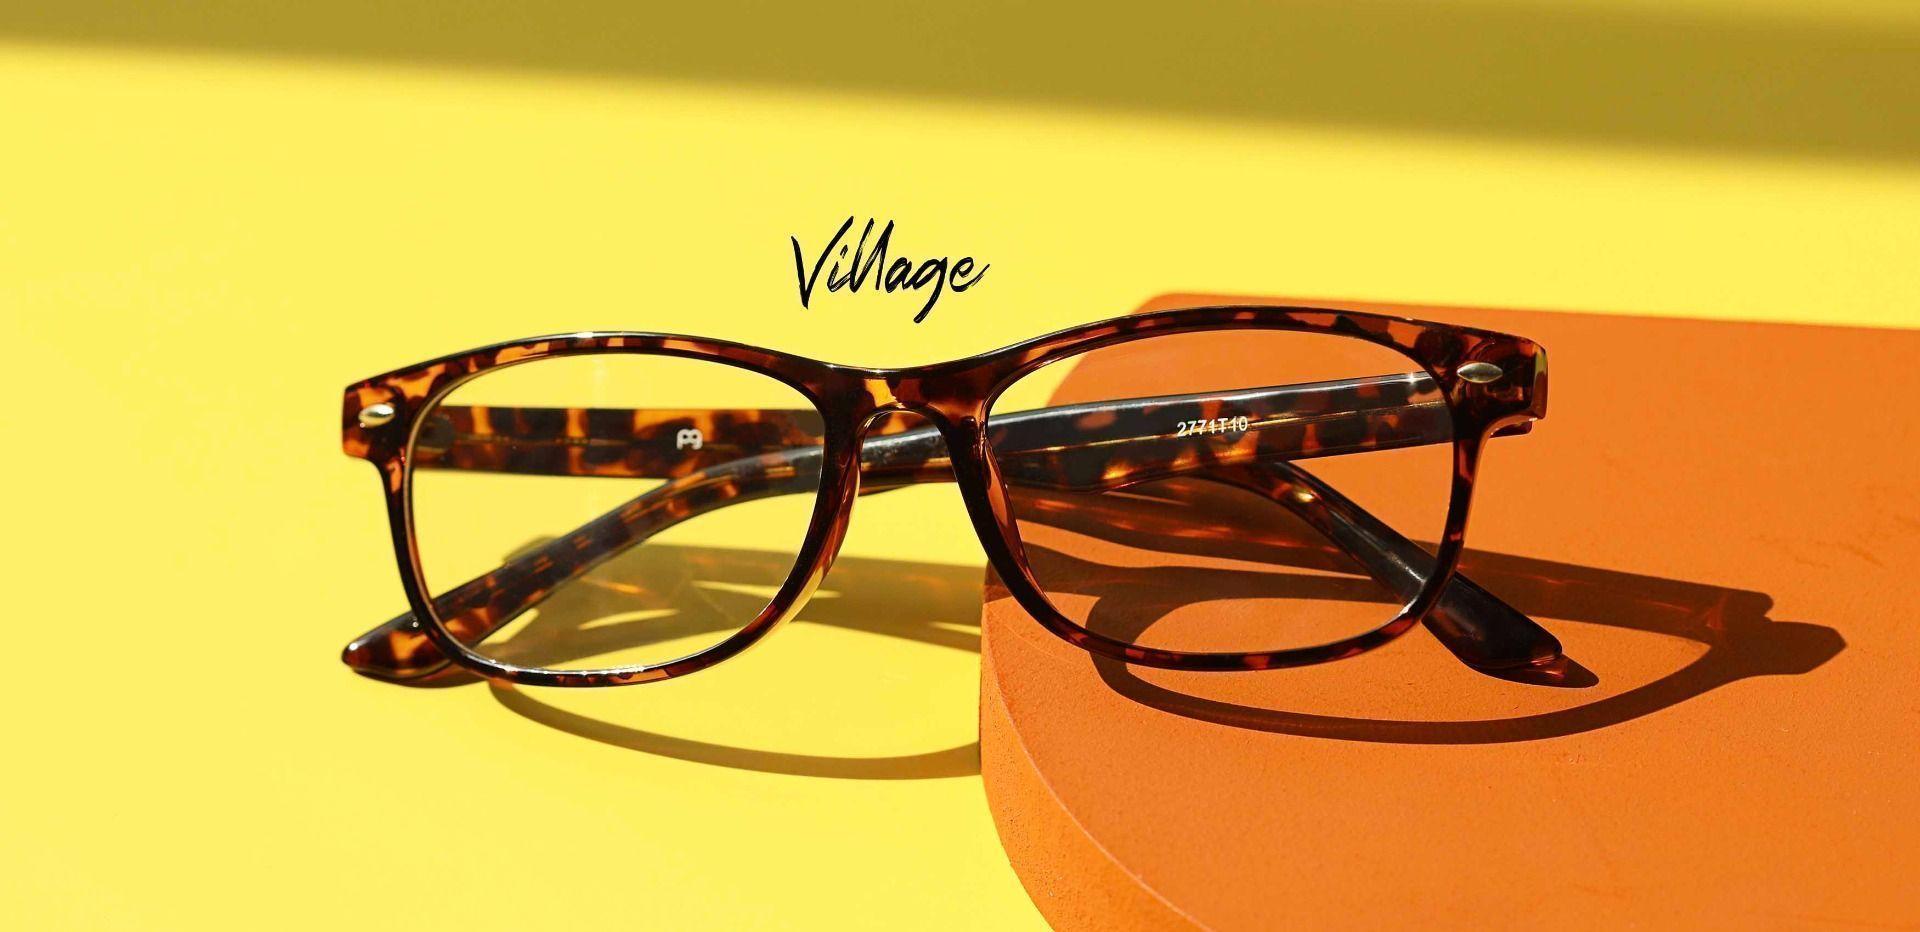 Village Rectangle Prescription Glasses - Tortoise